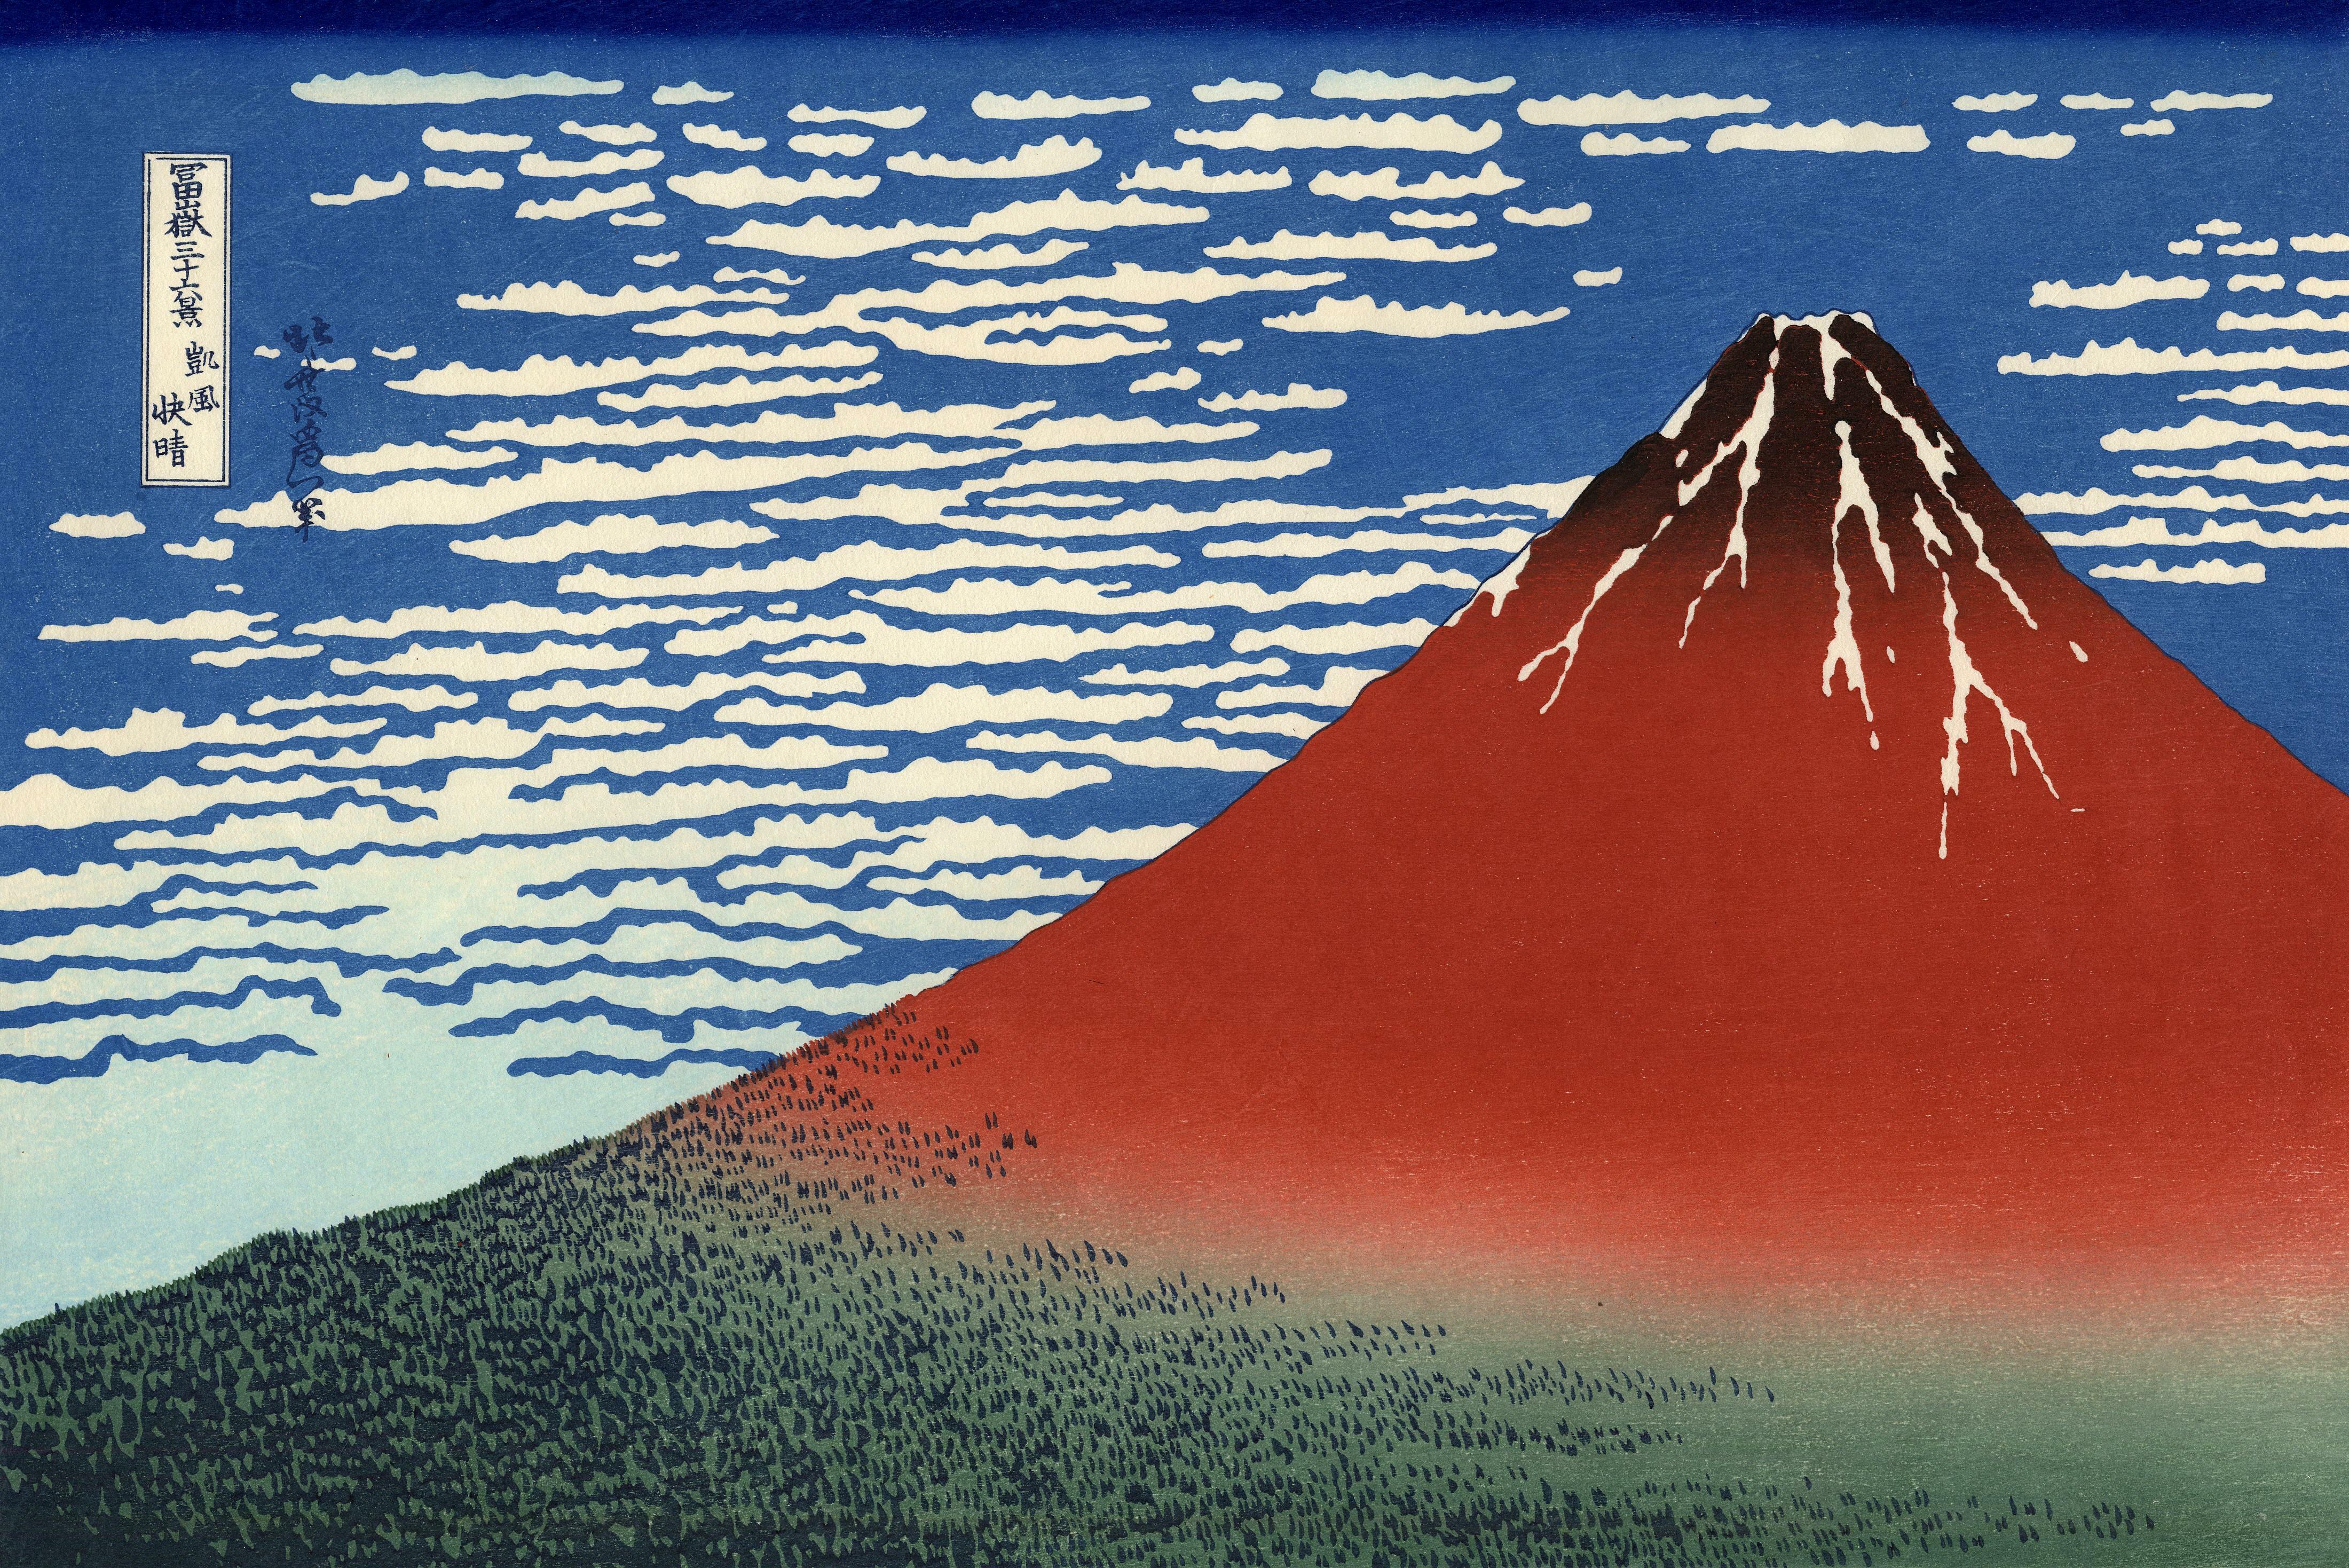 Grabado del monte Fuji por el artista japonés Katsushija Hokusai. // Google Arts & Culture